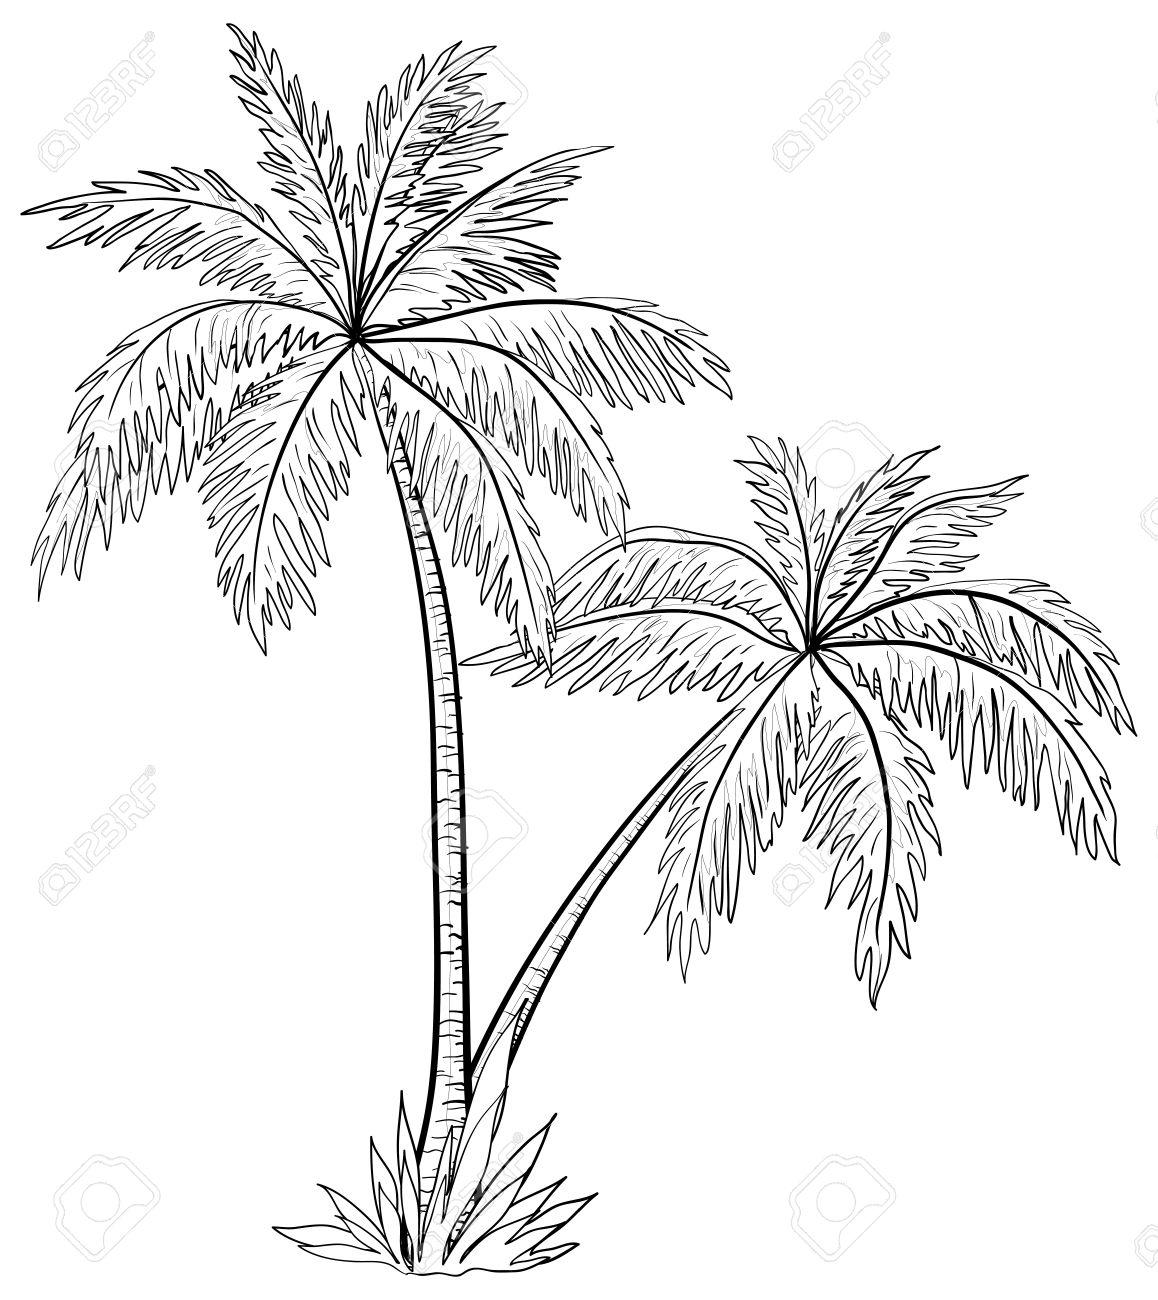 1158x1300 Drawn Palm Tree Black And White